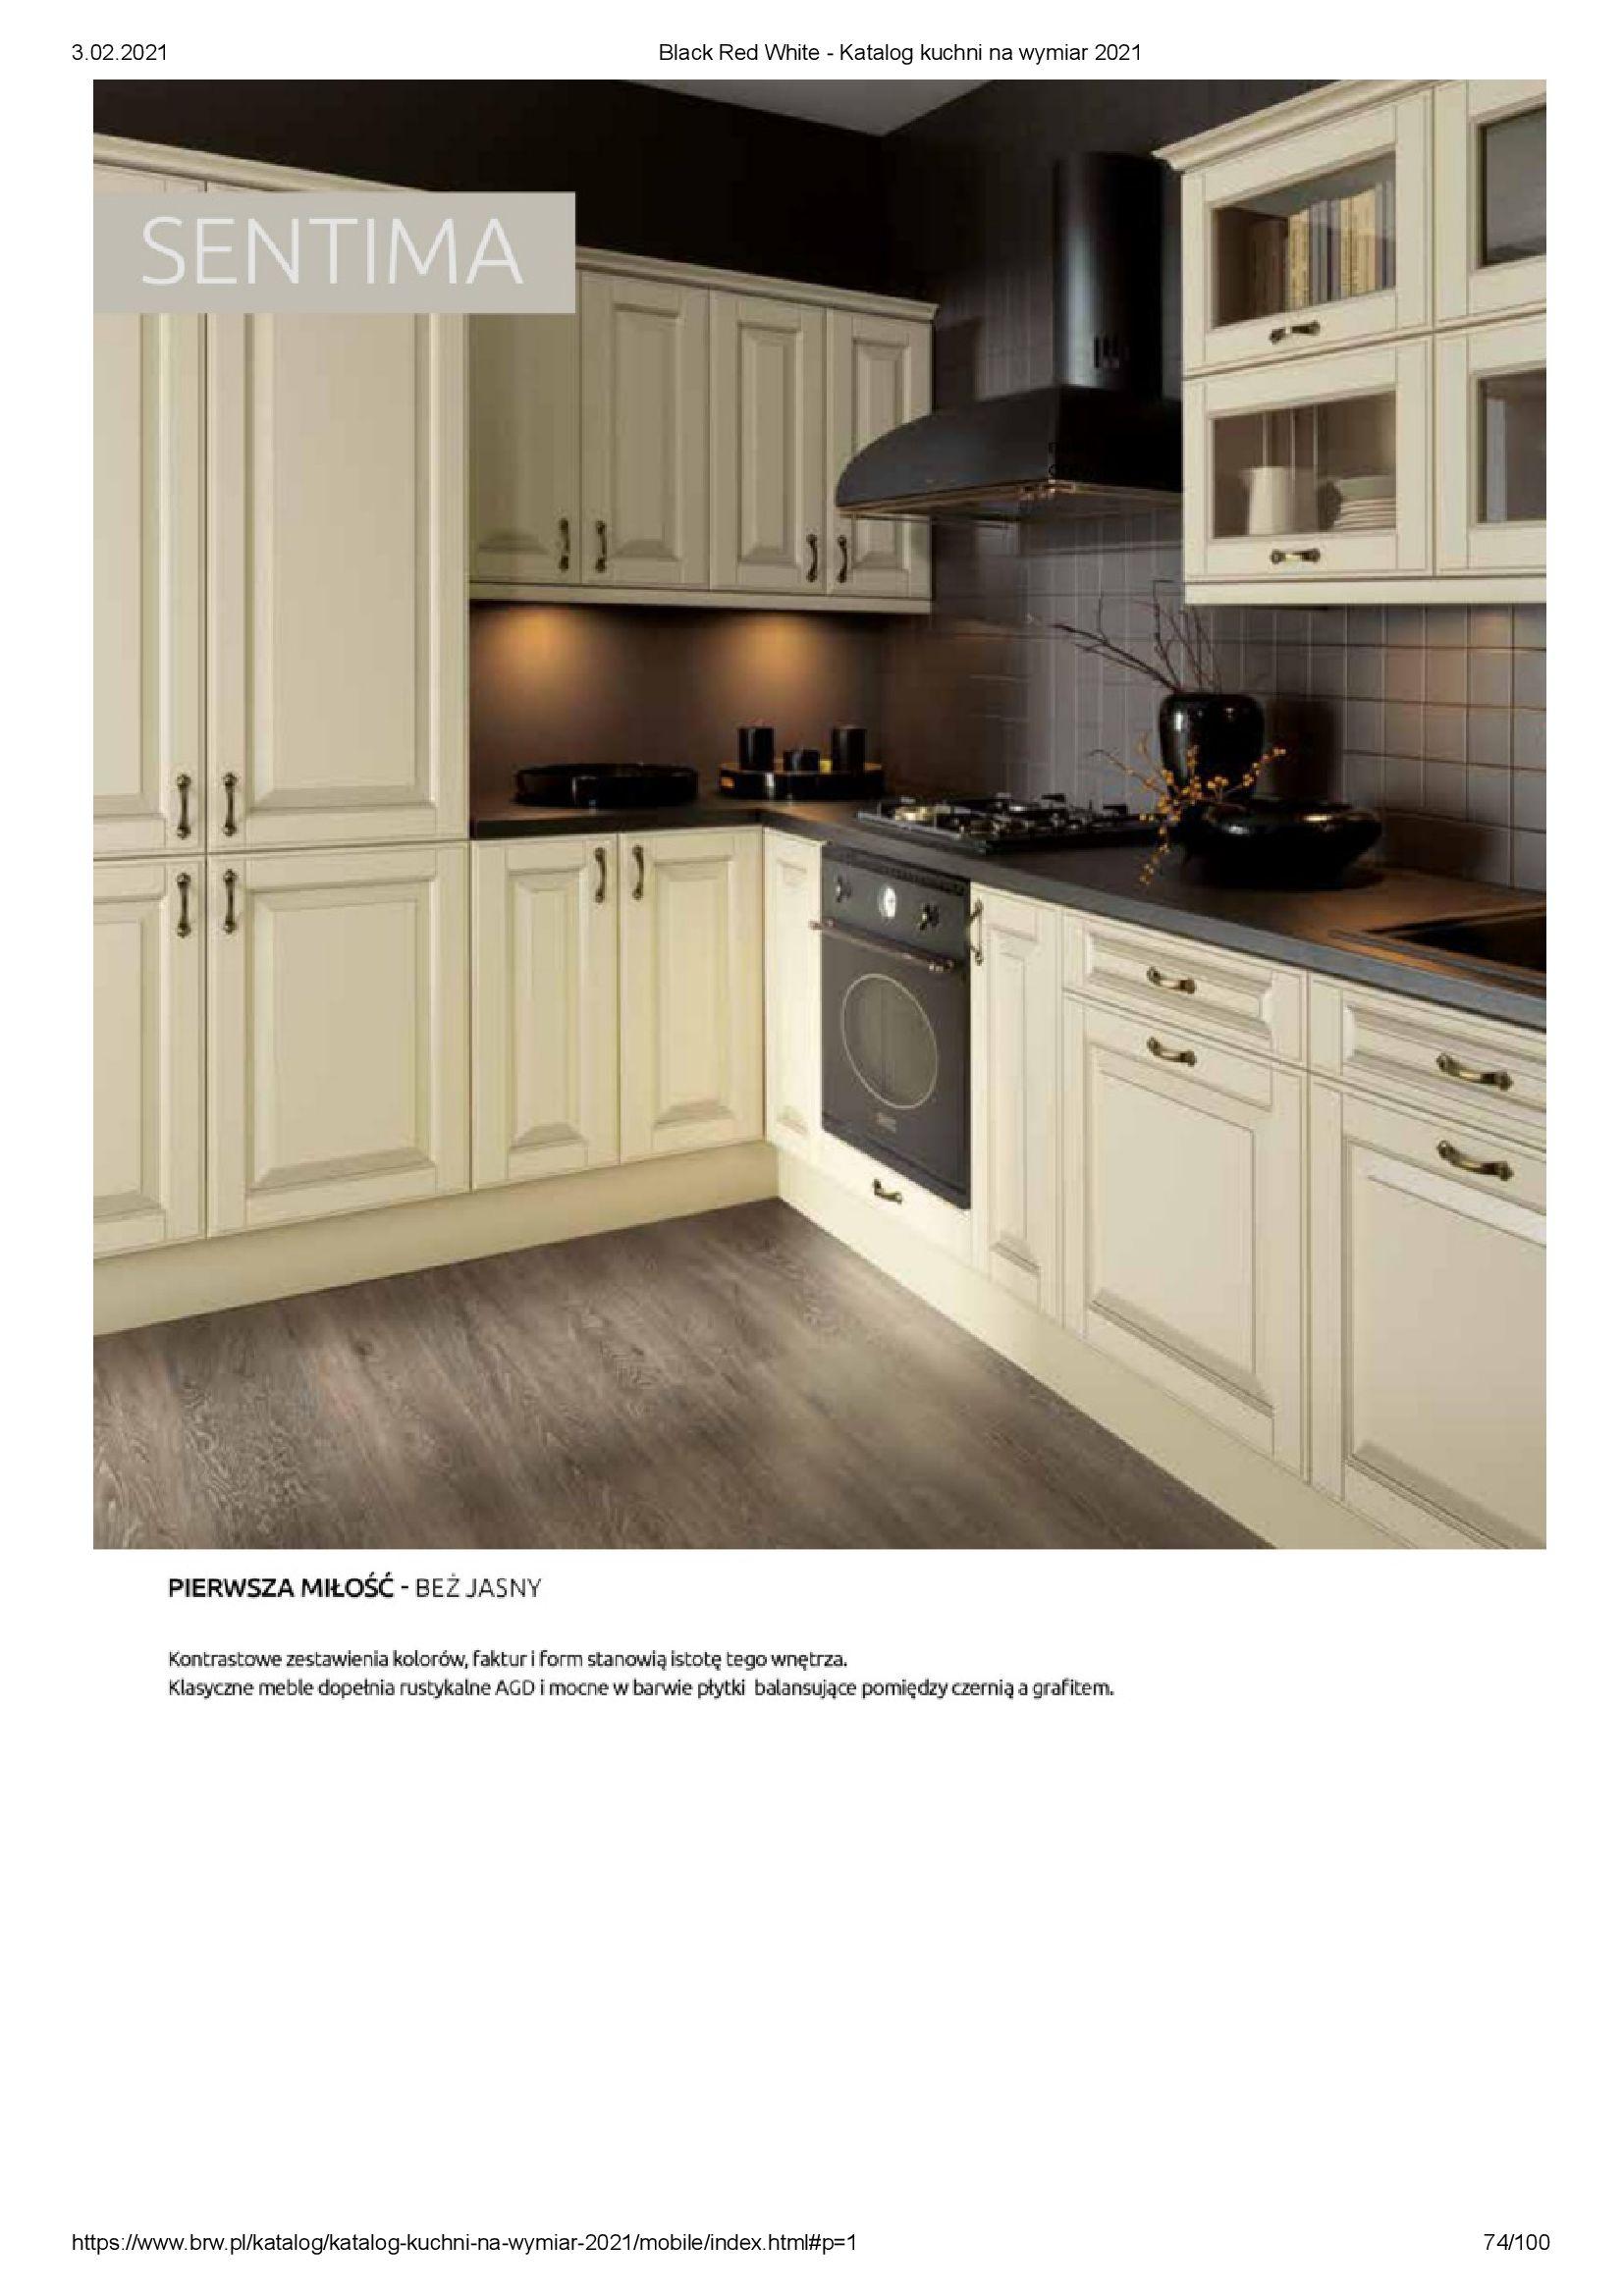 Gazetka Black Red White: Katalog - Kuchnie na wymiar Senso Kitchens 2021 2021-01-01 page-74